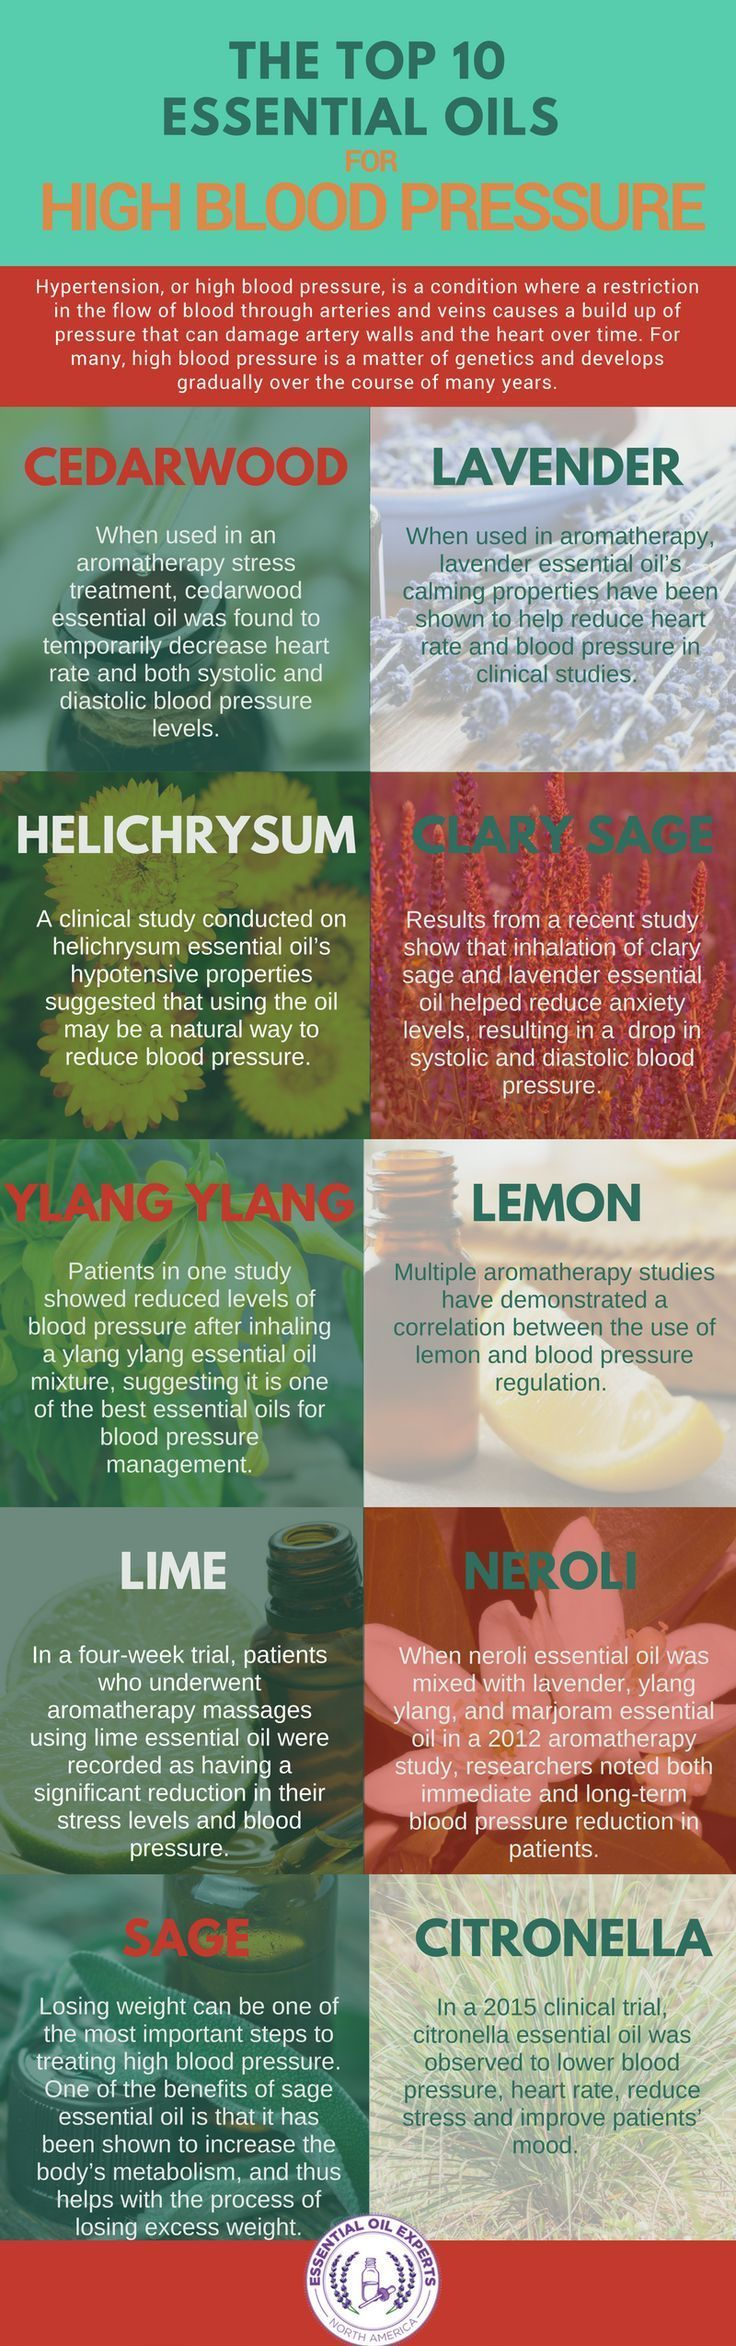 Top 10 Essential Oils for High Blood Pressure   Blood Pressure Remedies